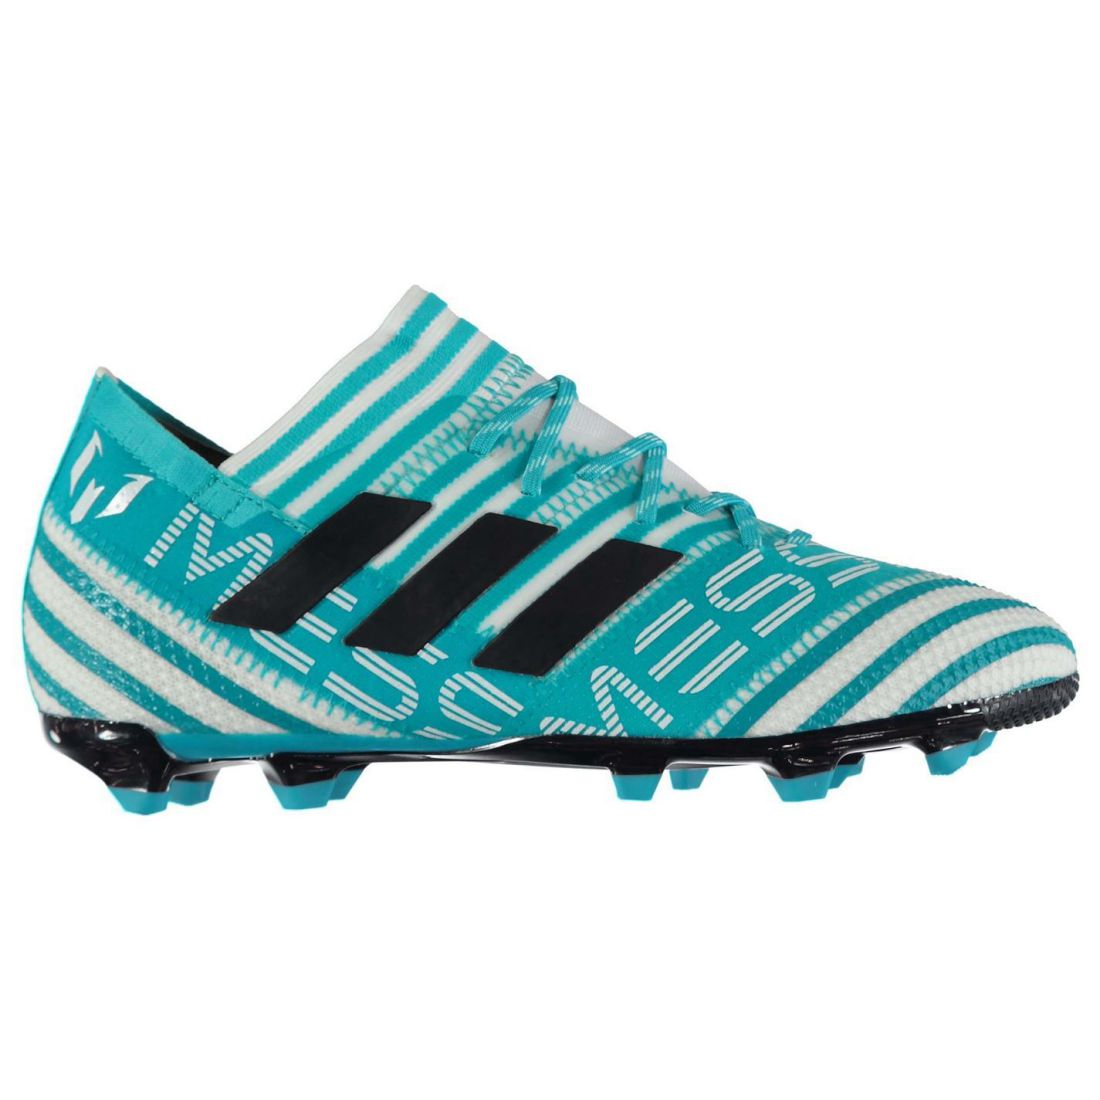 adidas Nemeziz Messi 17.1 FG Youngster Football Boots Childrens Firm ... 9b503b578ec